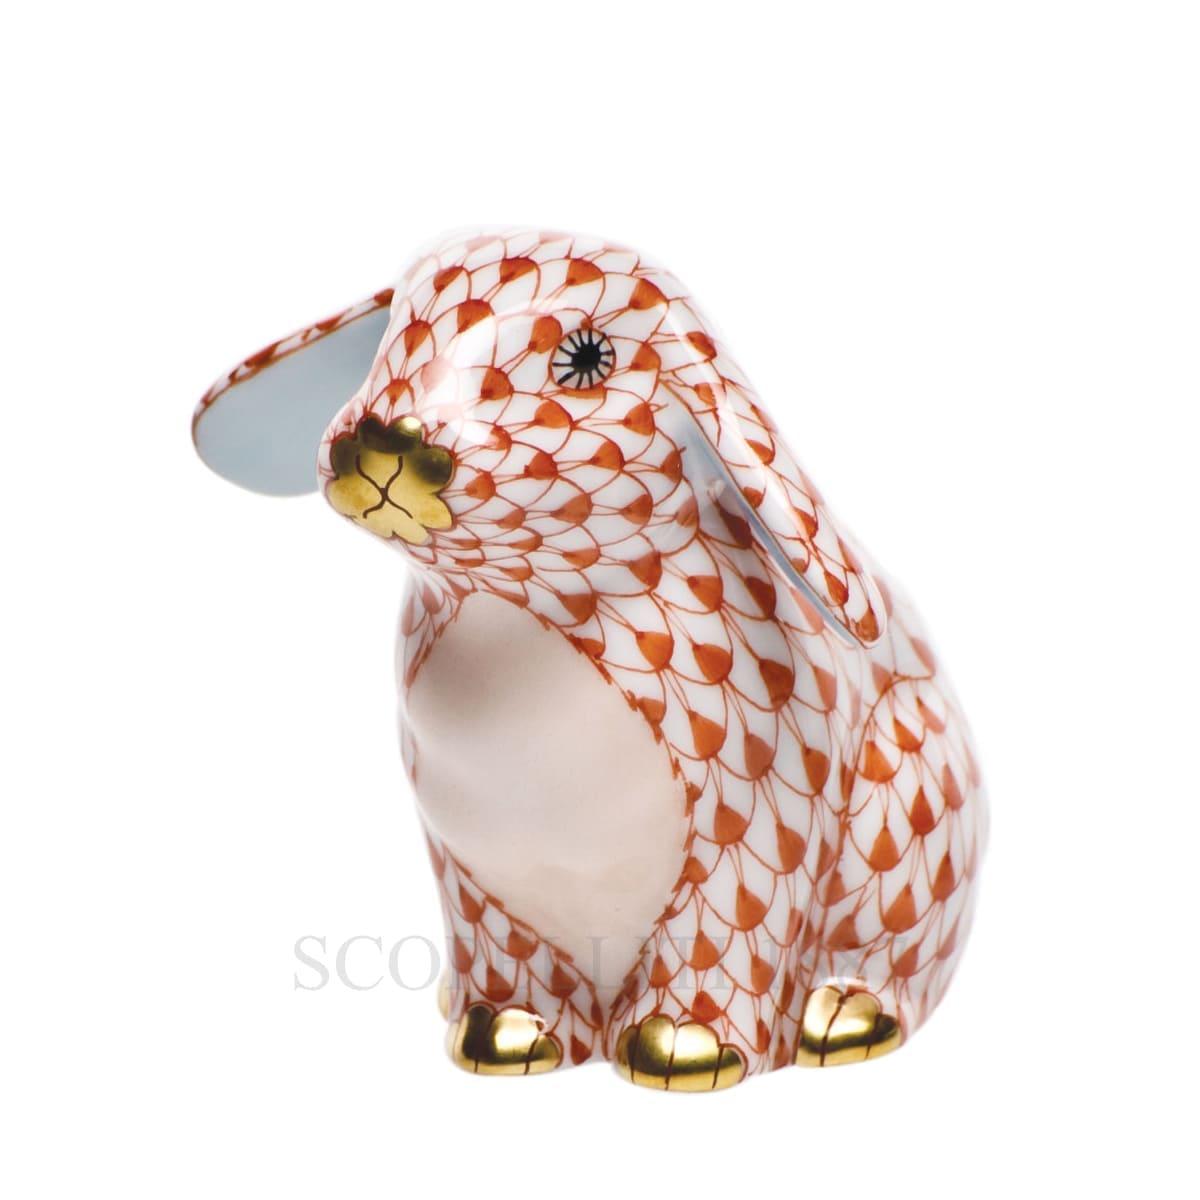 herend porcelain bunny figurine orange